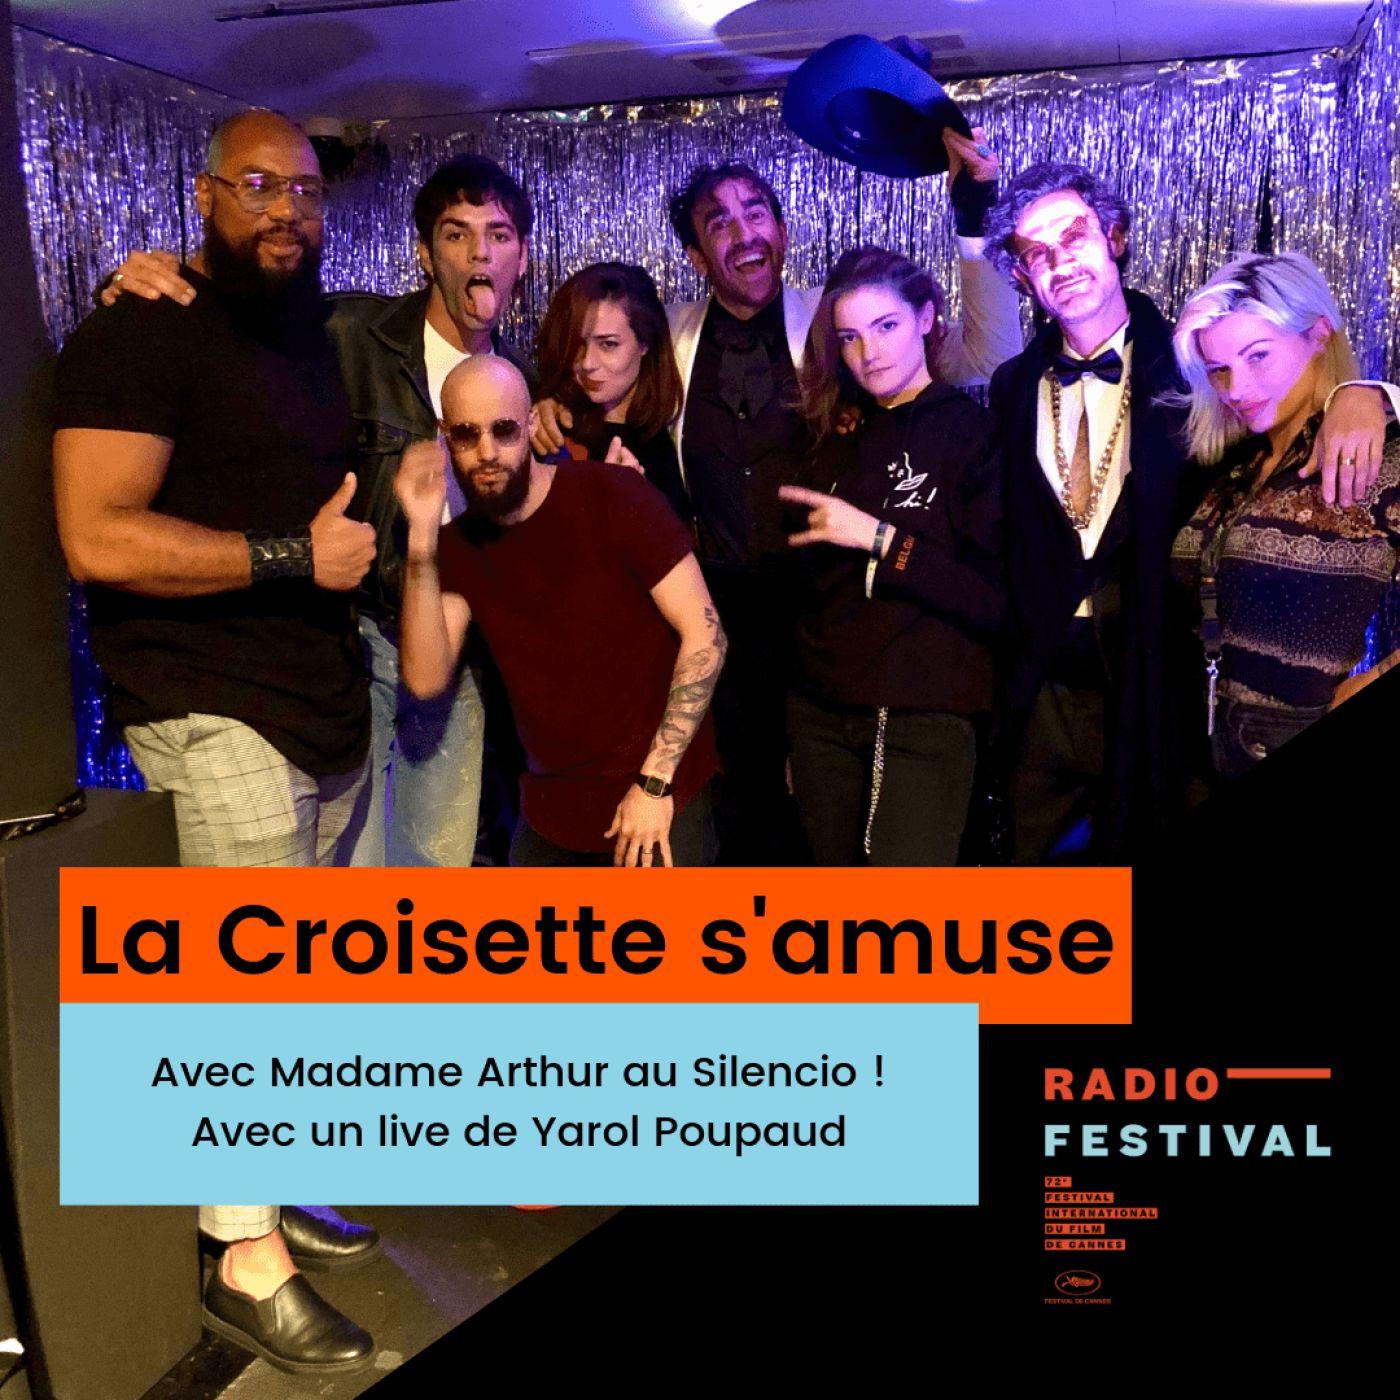 Au Silencio avec Madame Arthur et Yarol Poupaud - 21 mai 2019